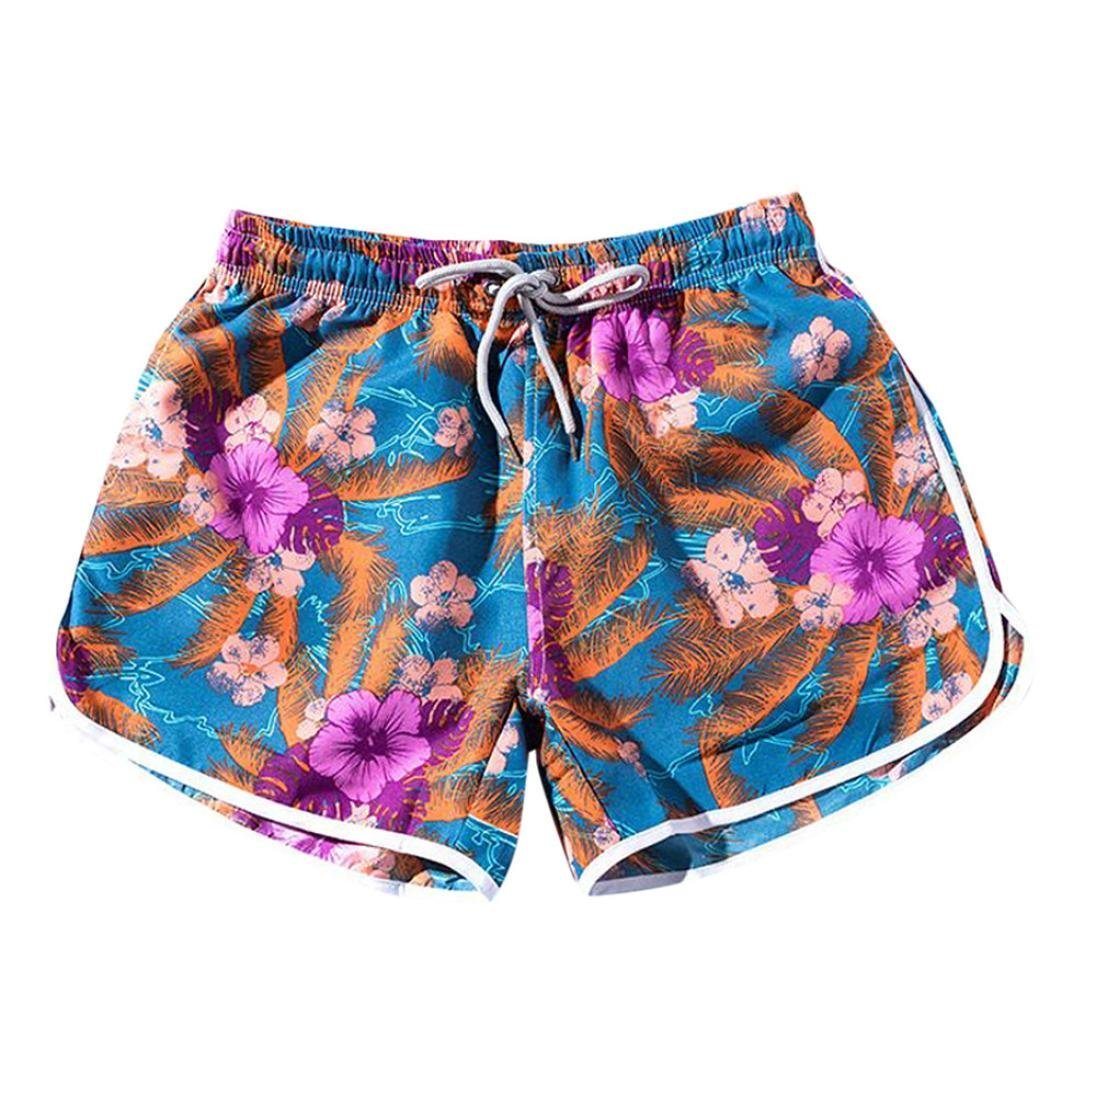 Inkach - Womens Drawstring Summer Shorts - Elastic Waist Floral Printed Beach Short Pants Mini Lounge Shorts (L, Blue)